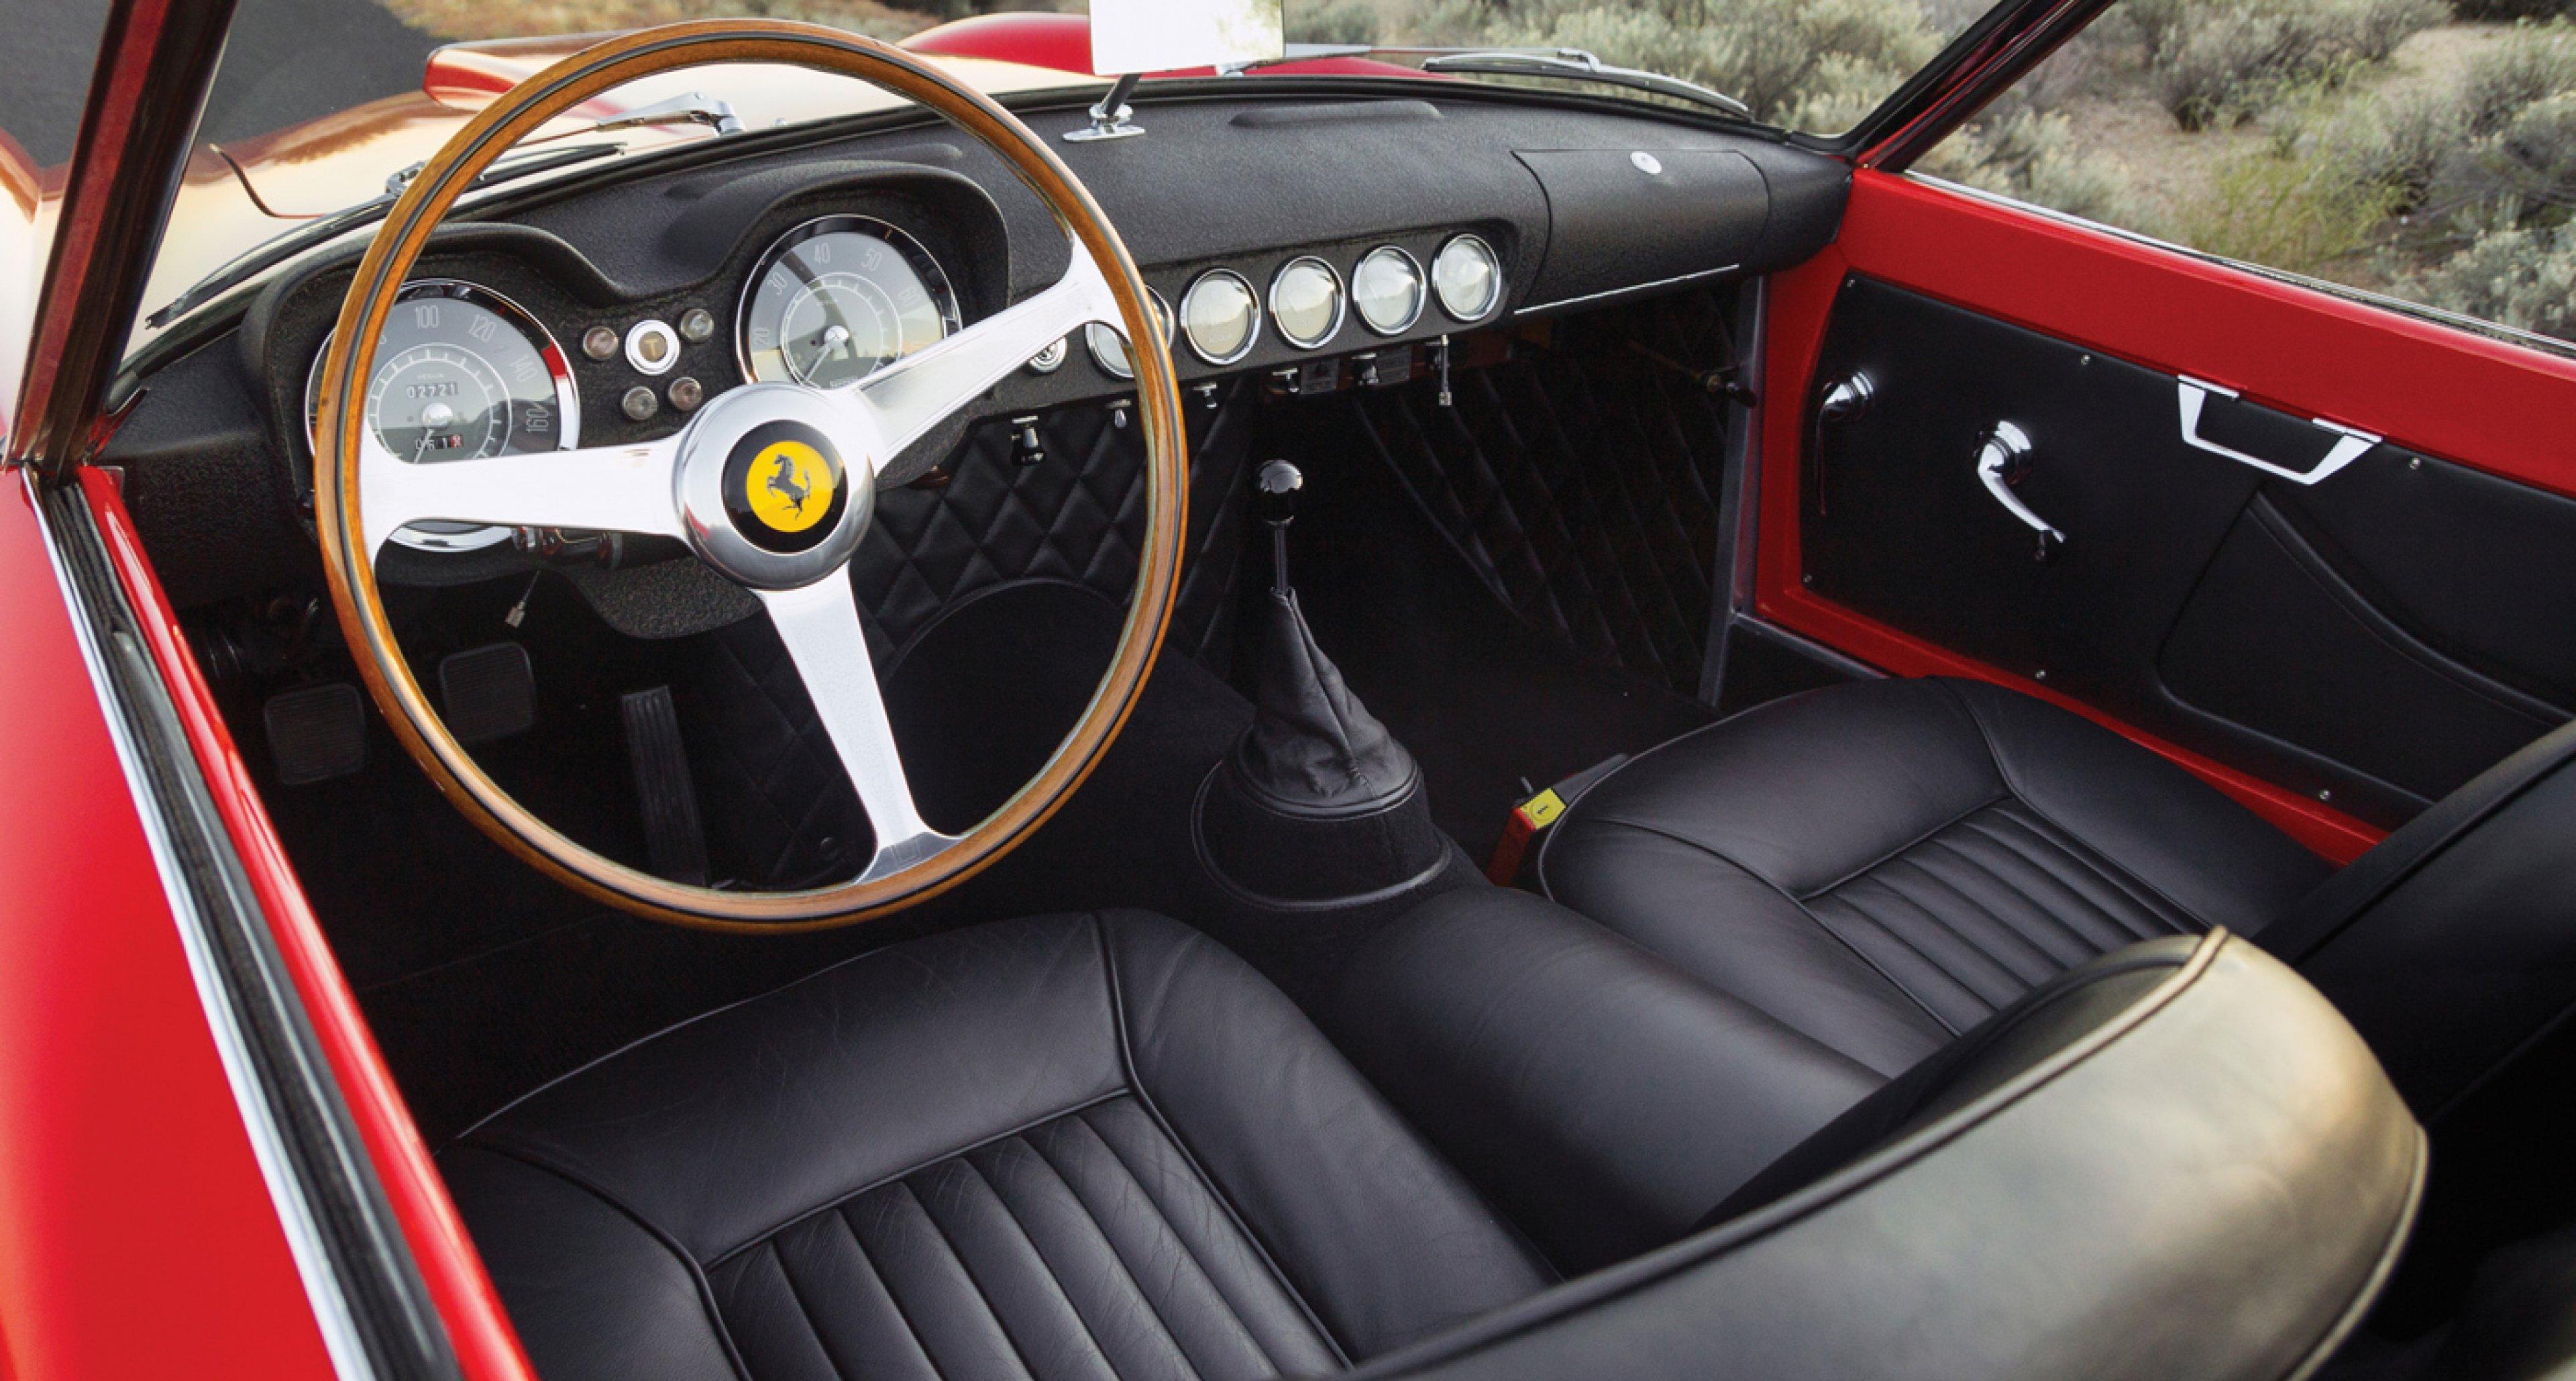 1958 Ferrari 250 GT LWB California Spider